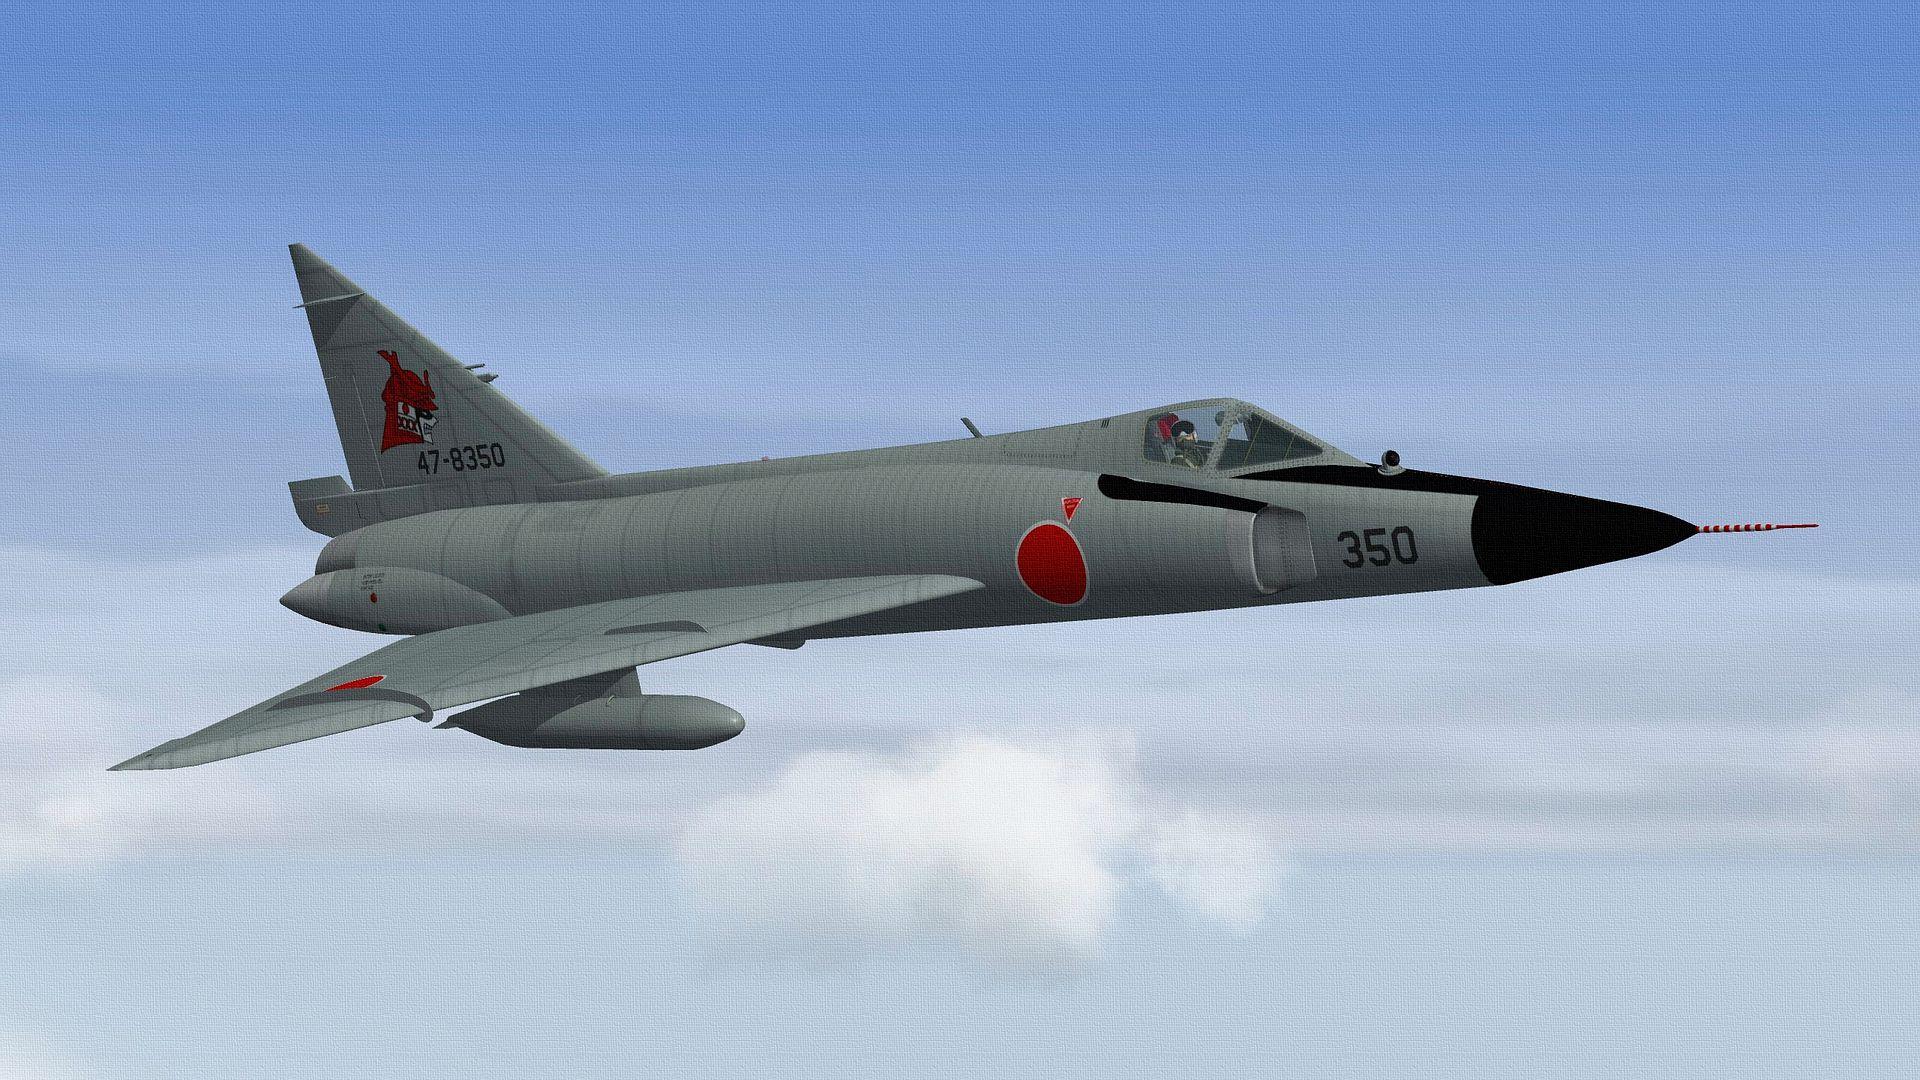 JASDF%20F-102A%20DELTA%20DAGGER.06_zpskk